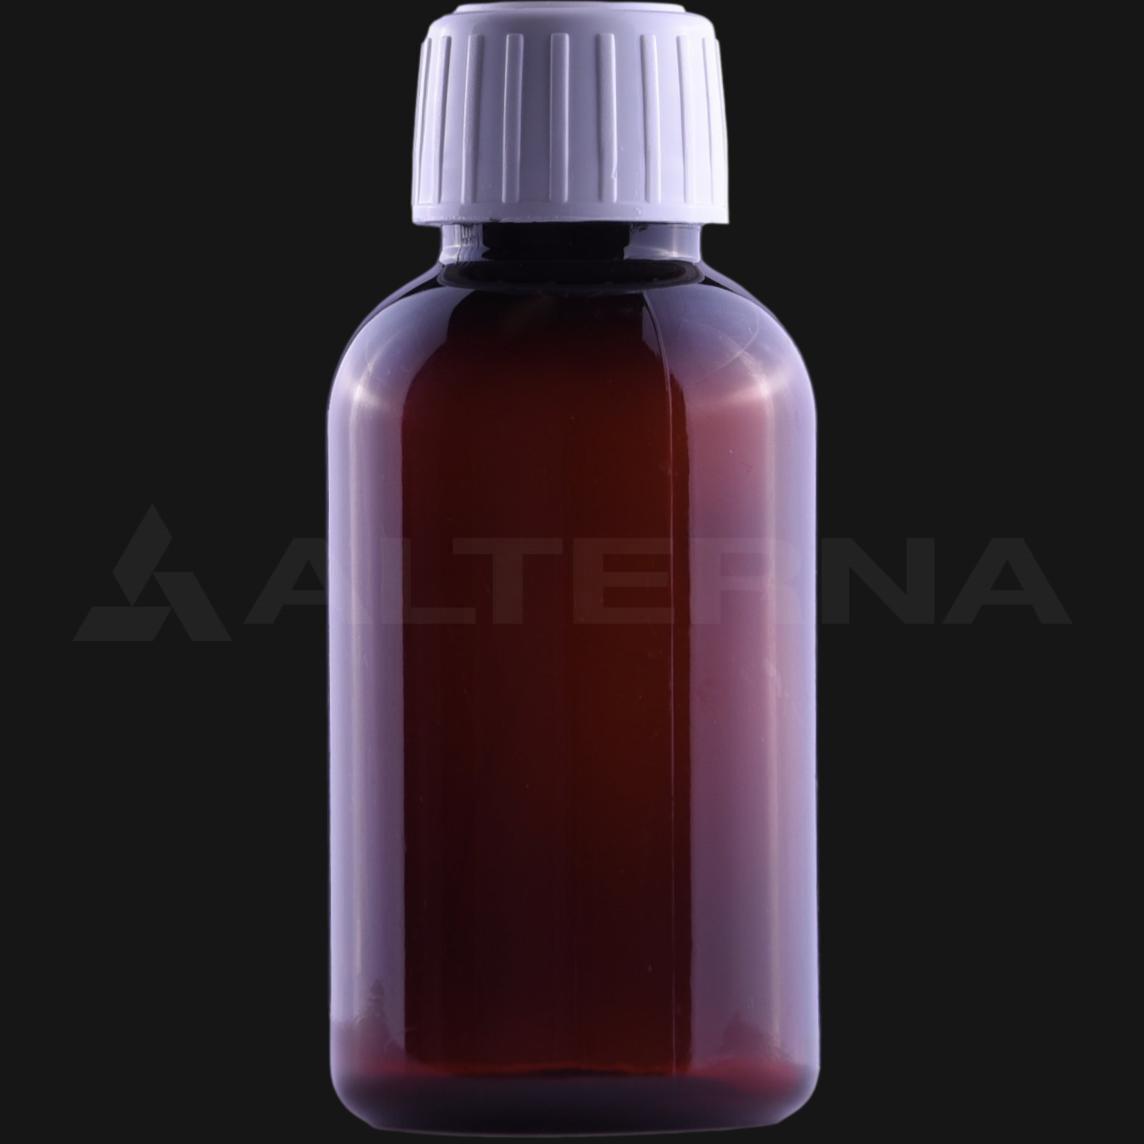 100 ml PET Pharma Bottle with 25 mm Tamper Evident Cap